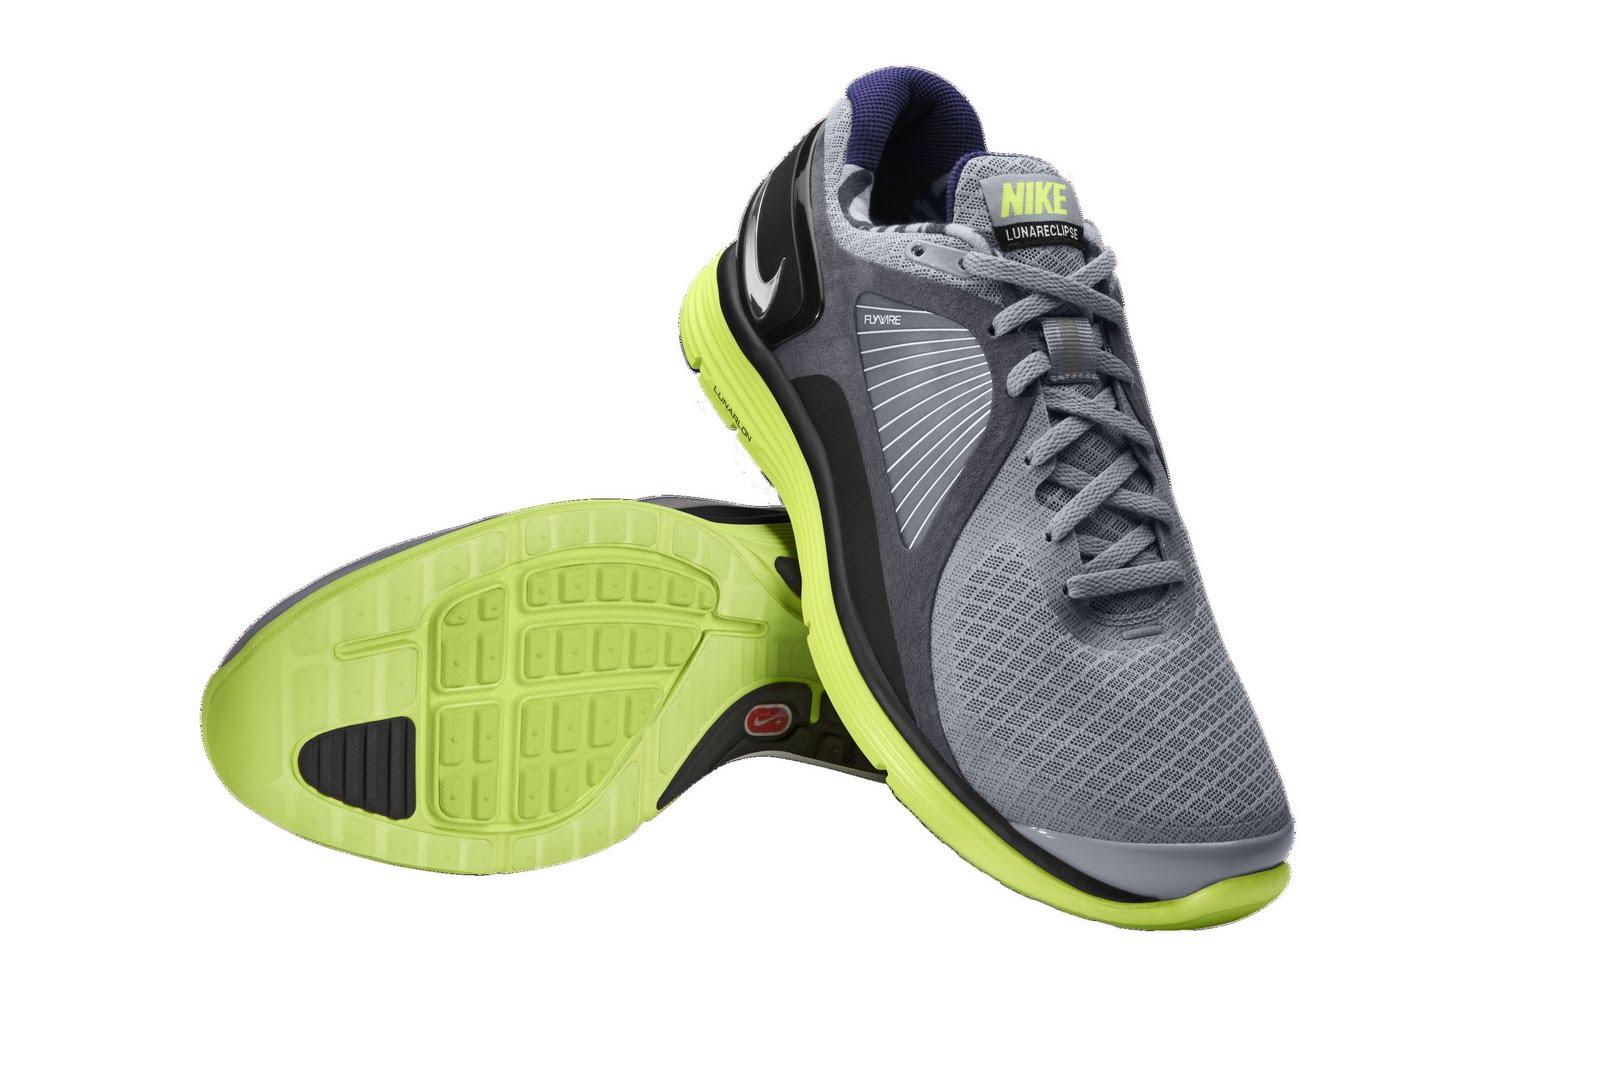 Light Running Shoes For Overpronators